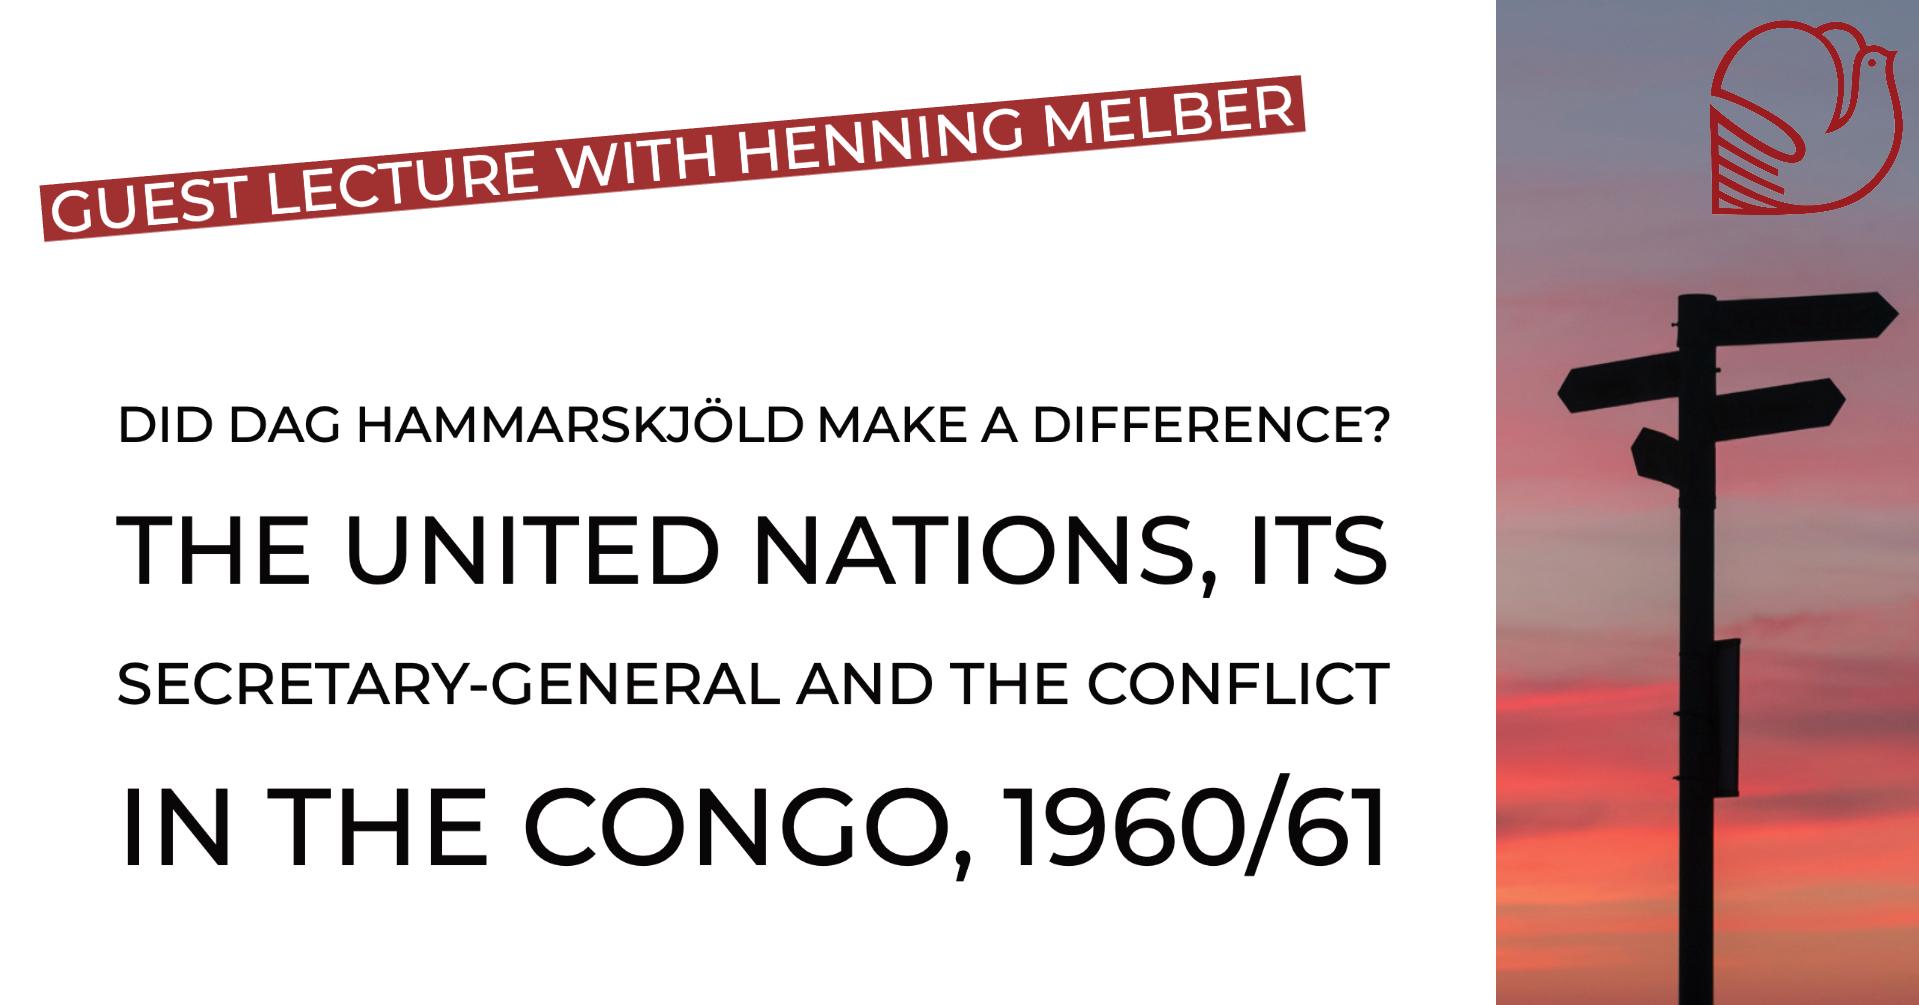 london converse | Peninsula Conflict Resolution Center